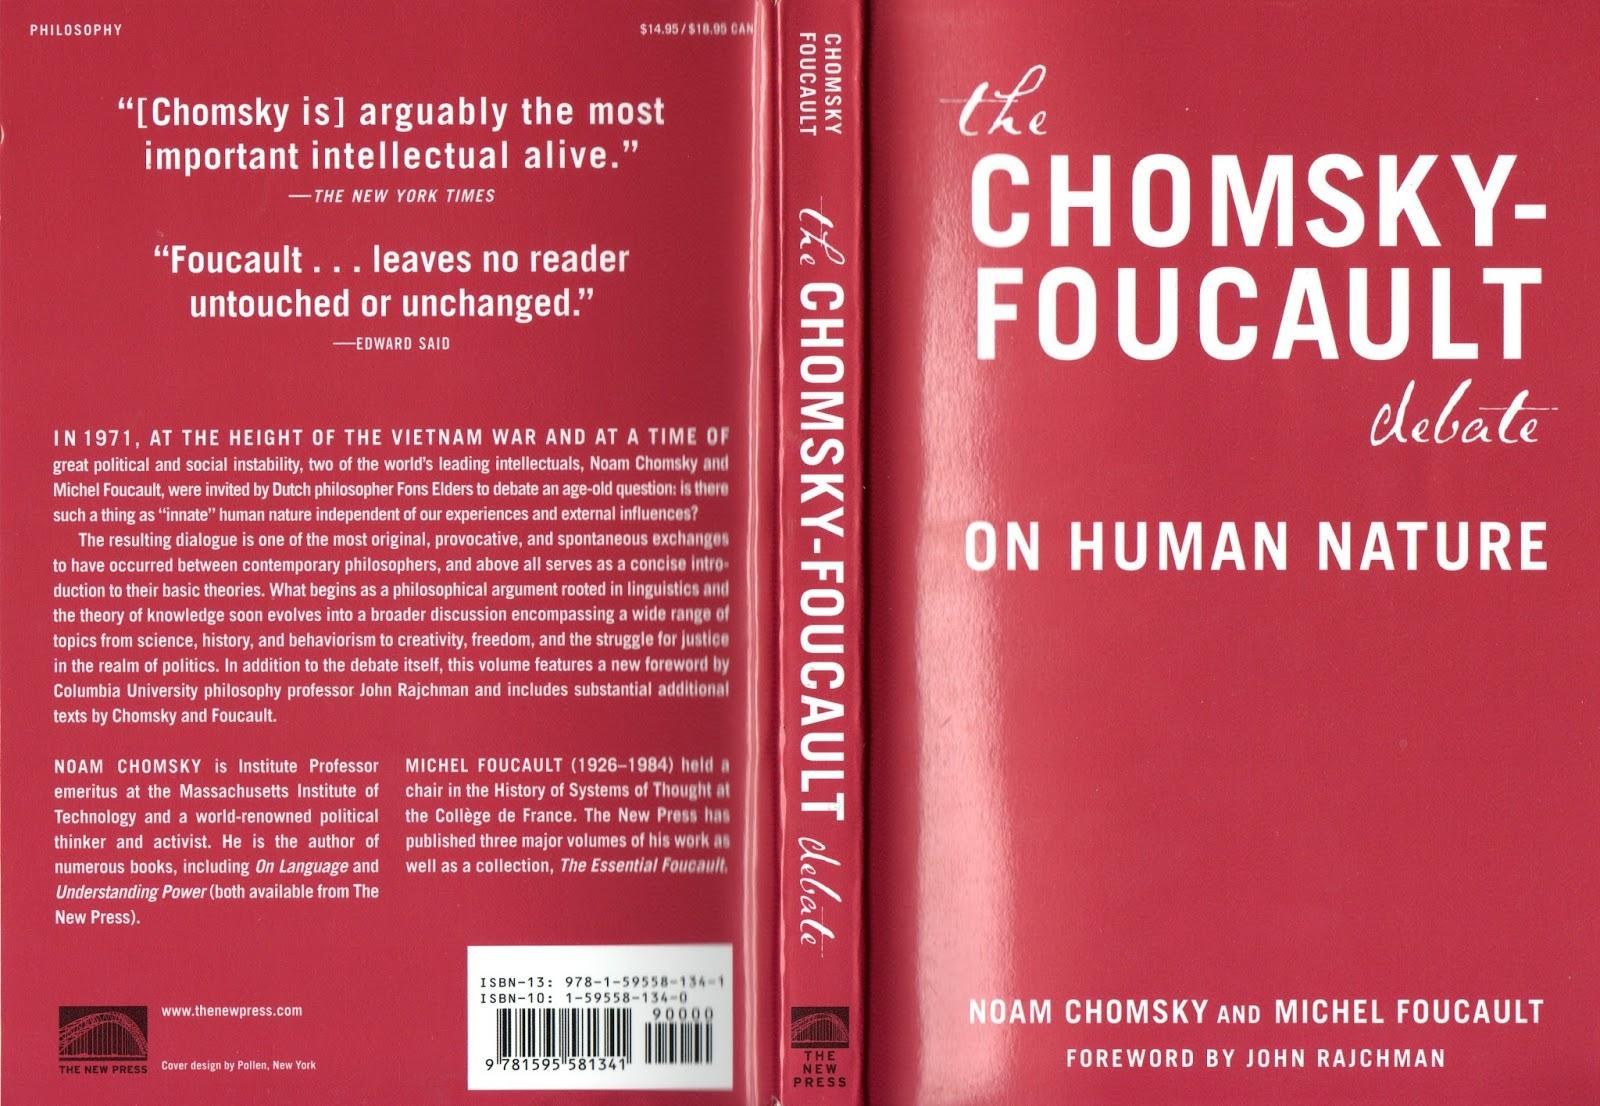 The Chomsky-Foucault debate on Human